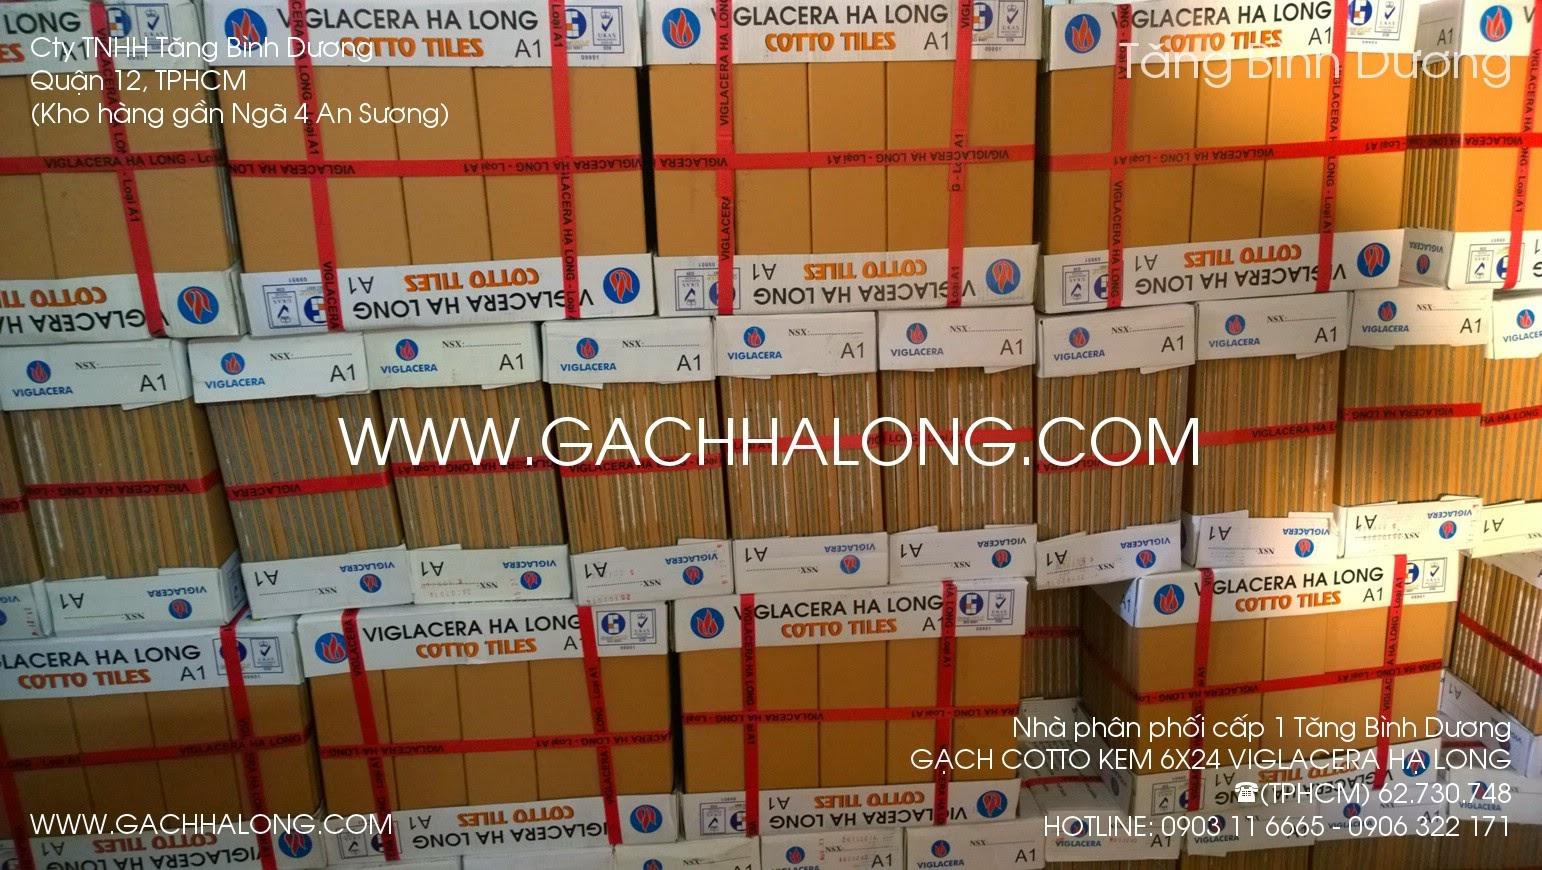 gach the kem 6x24 ha long